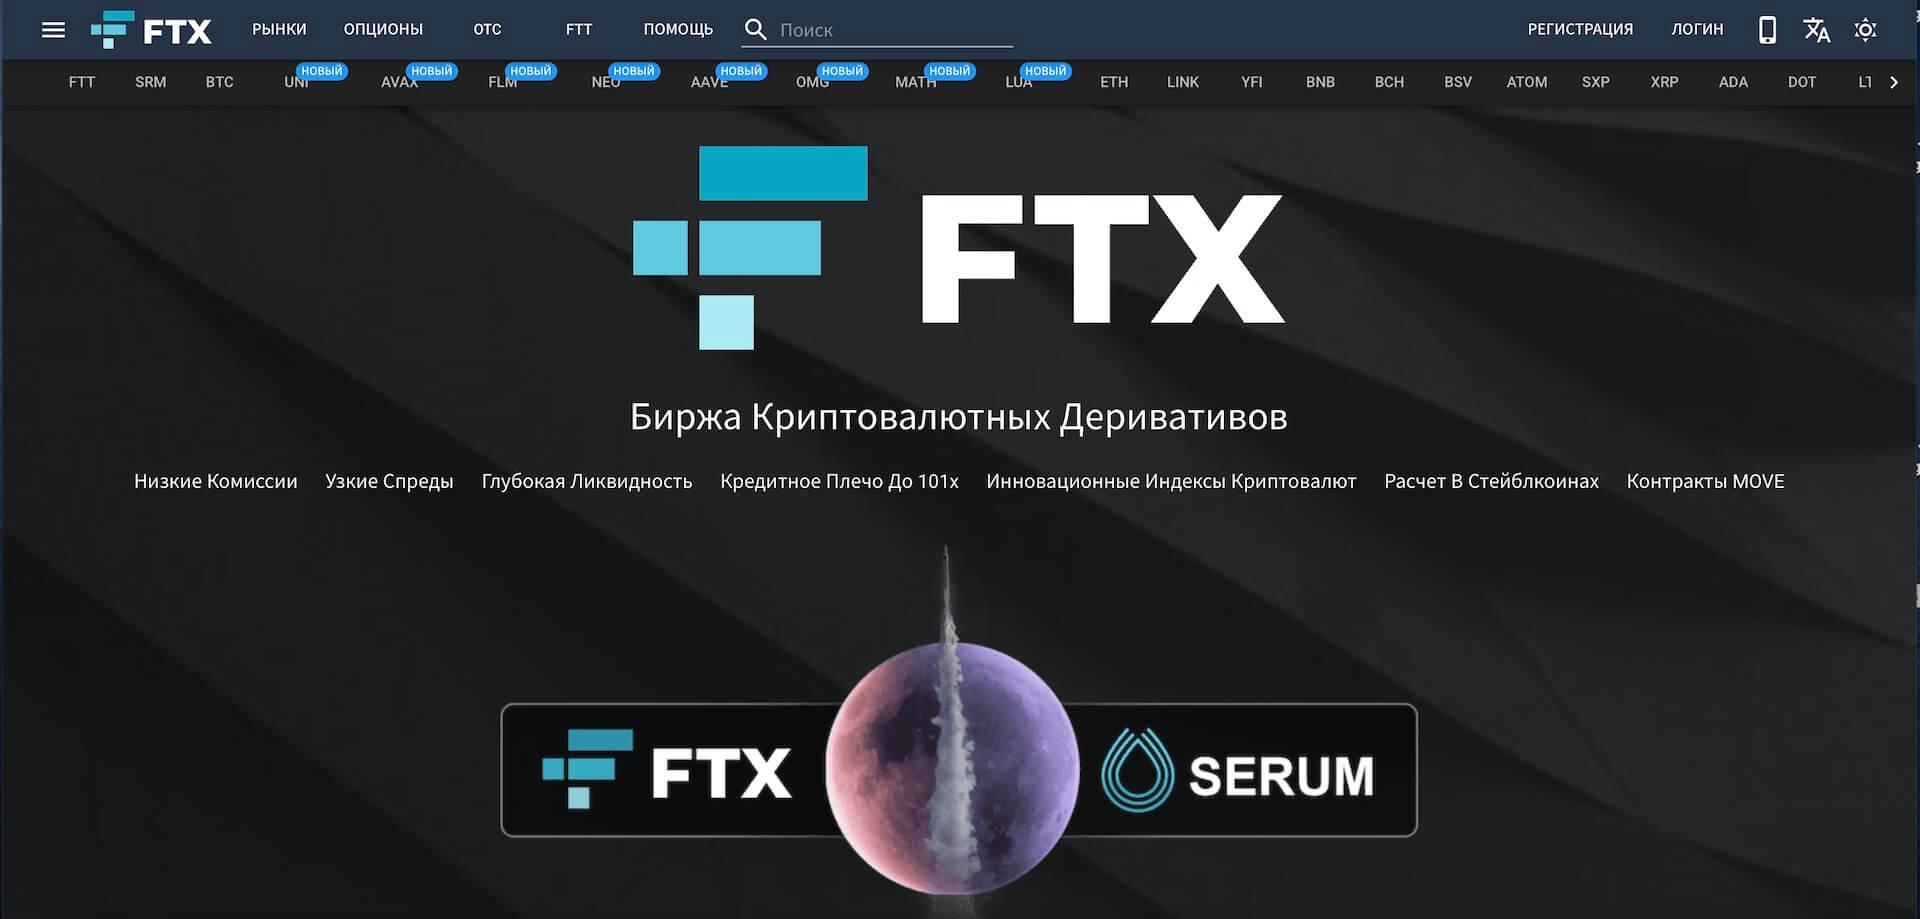 биржа криптовалют FTX